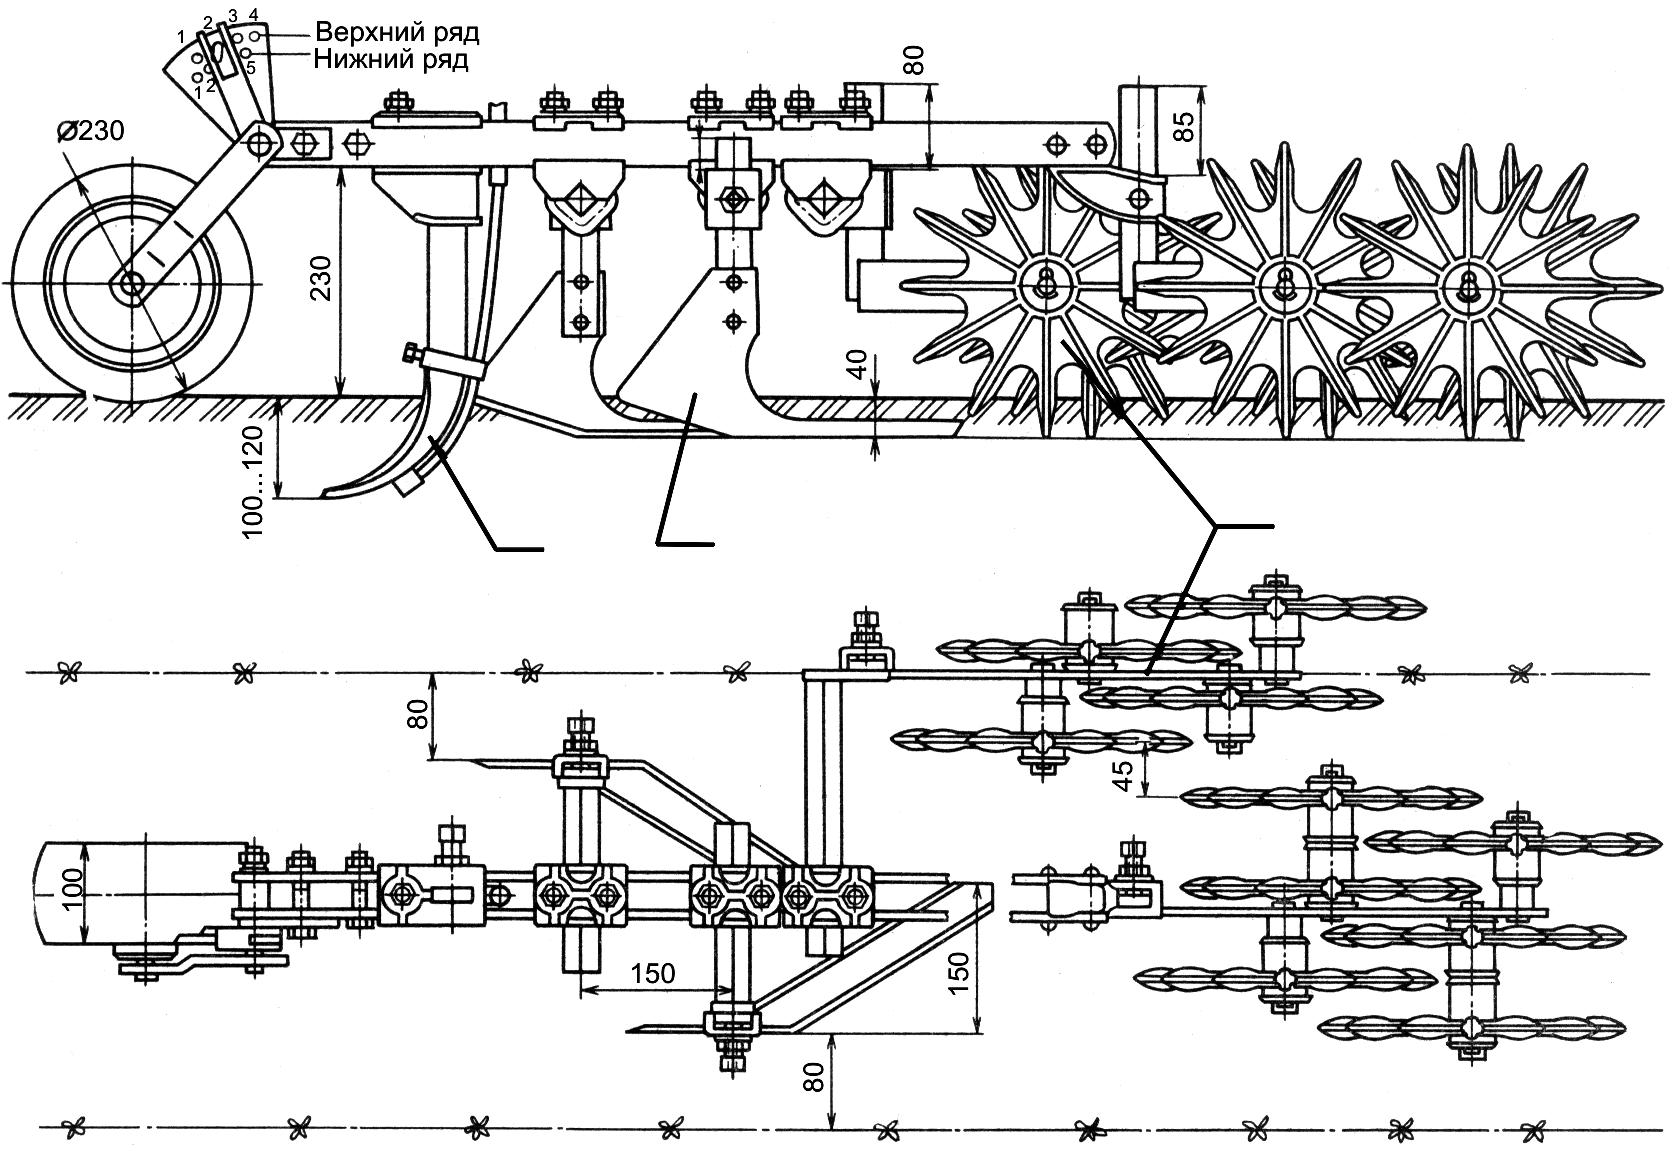 Плуг для минитрактора схема